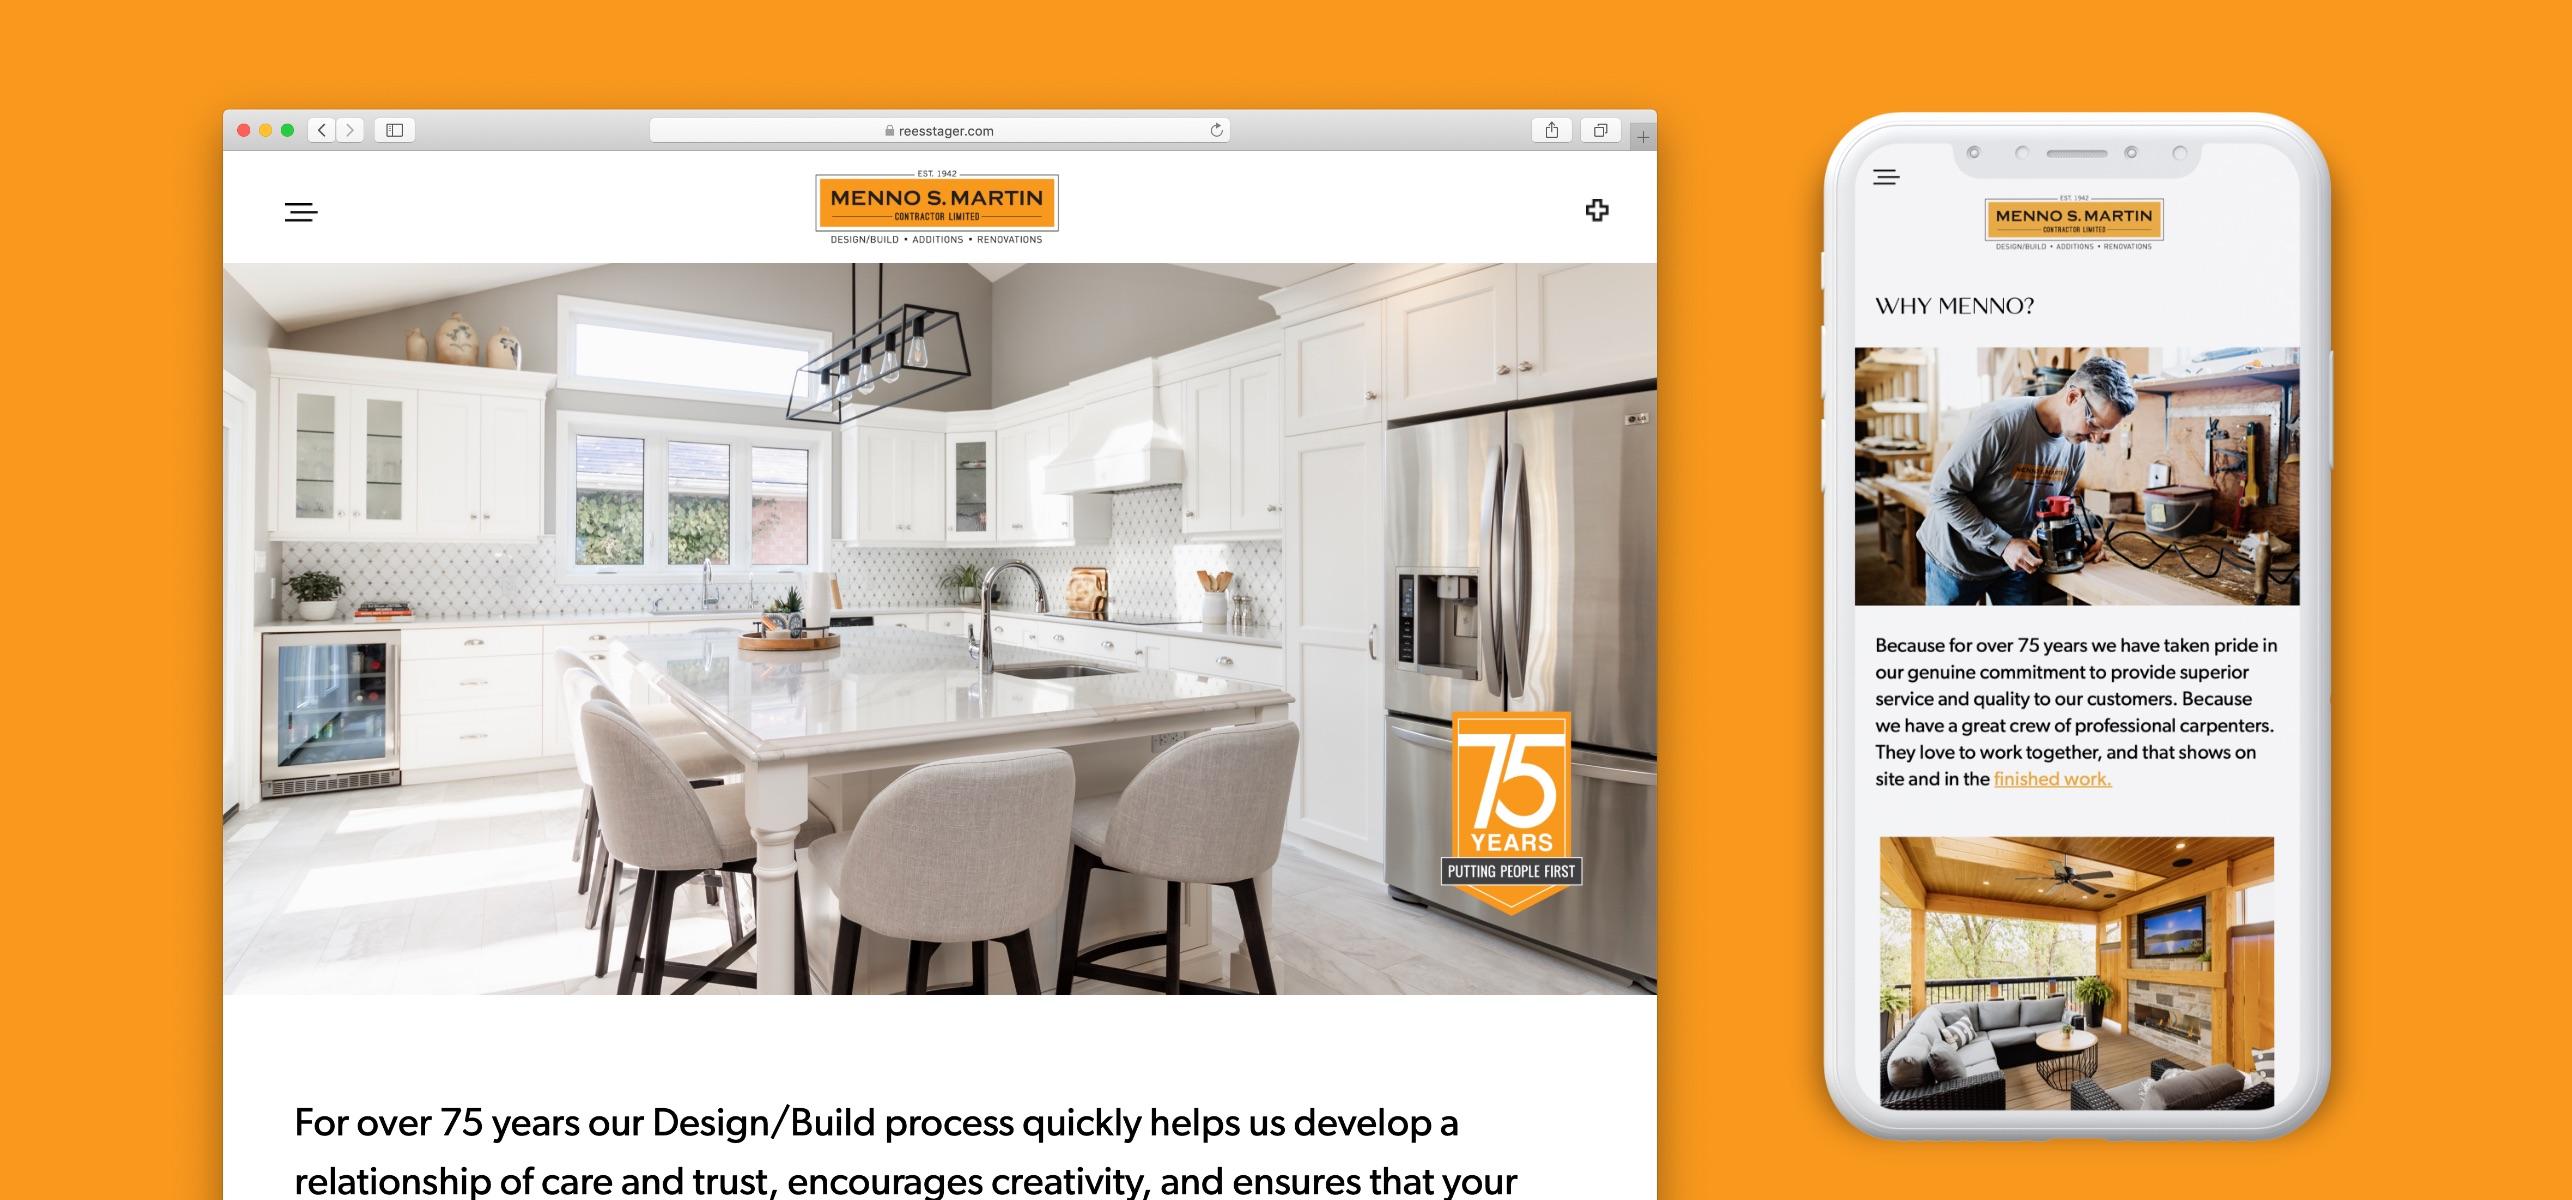 menno s martin website design